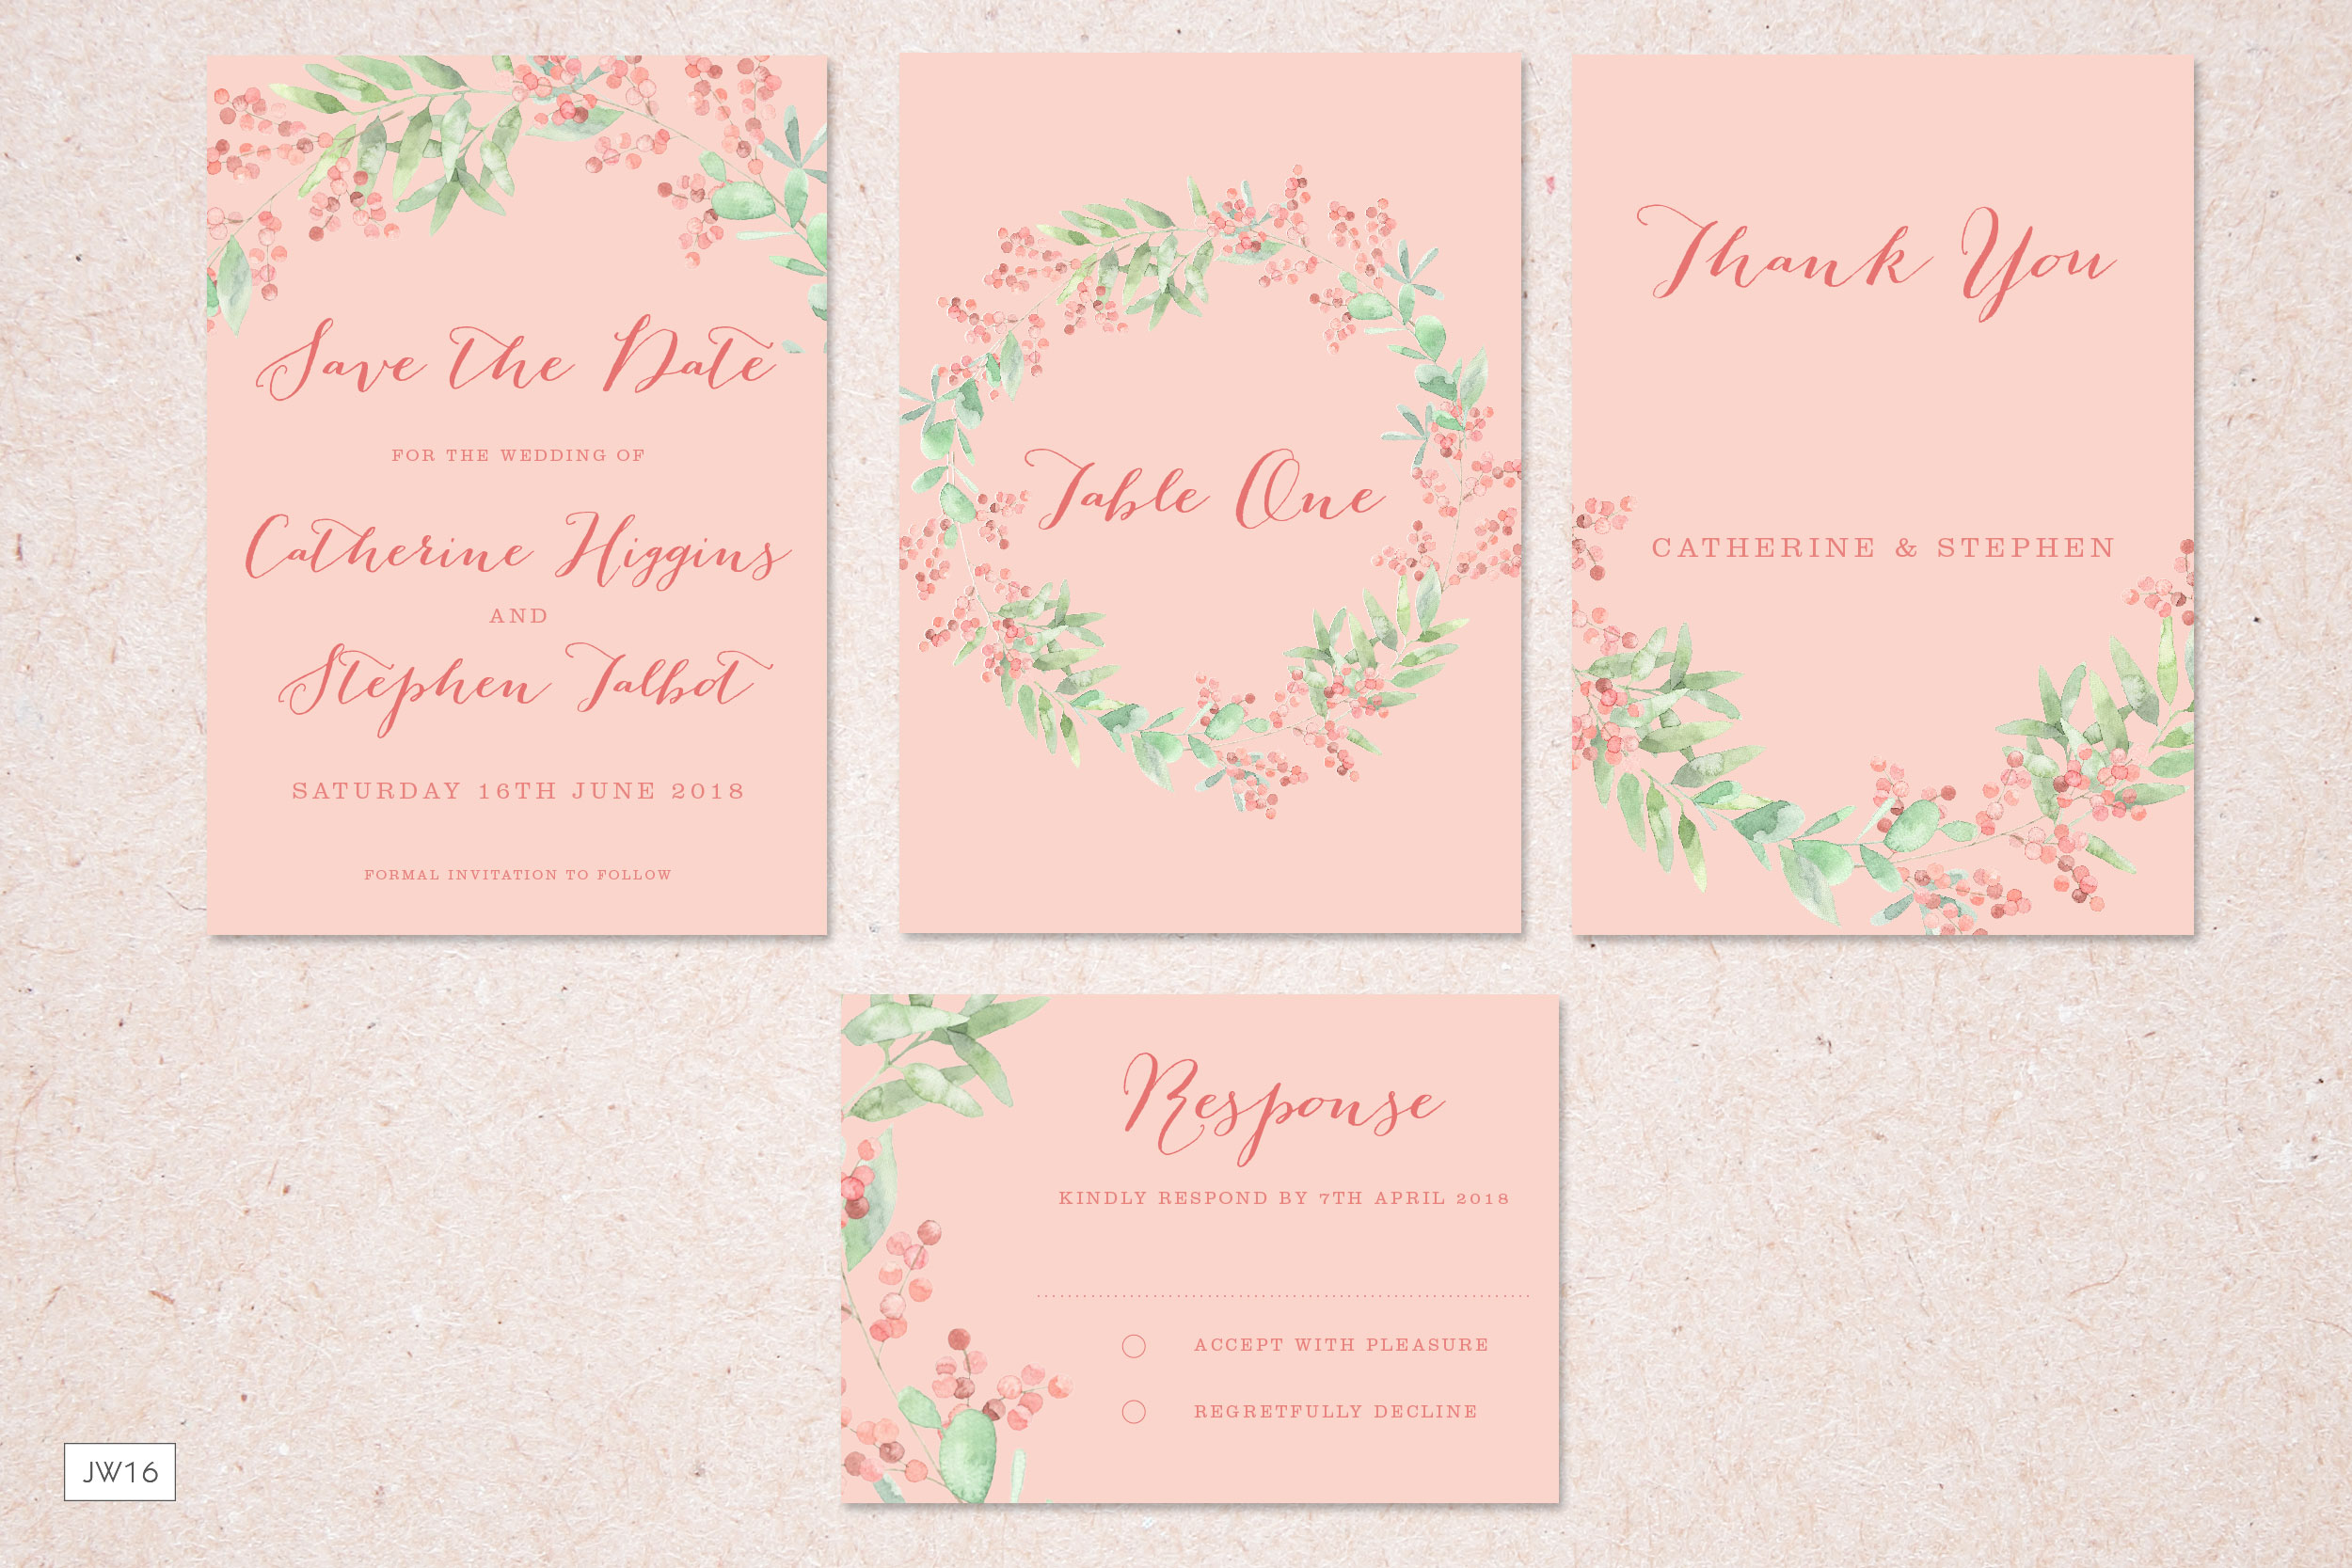 jersey-weddings-invitation-set-jw16.jpg